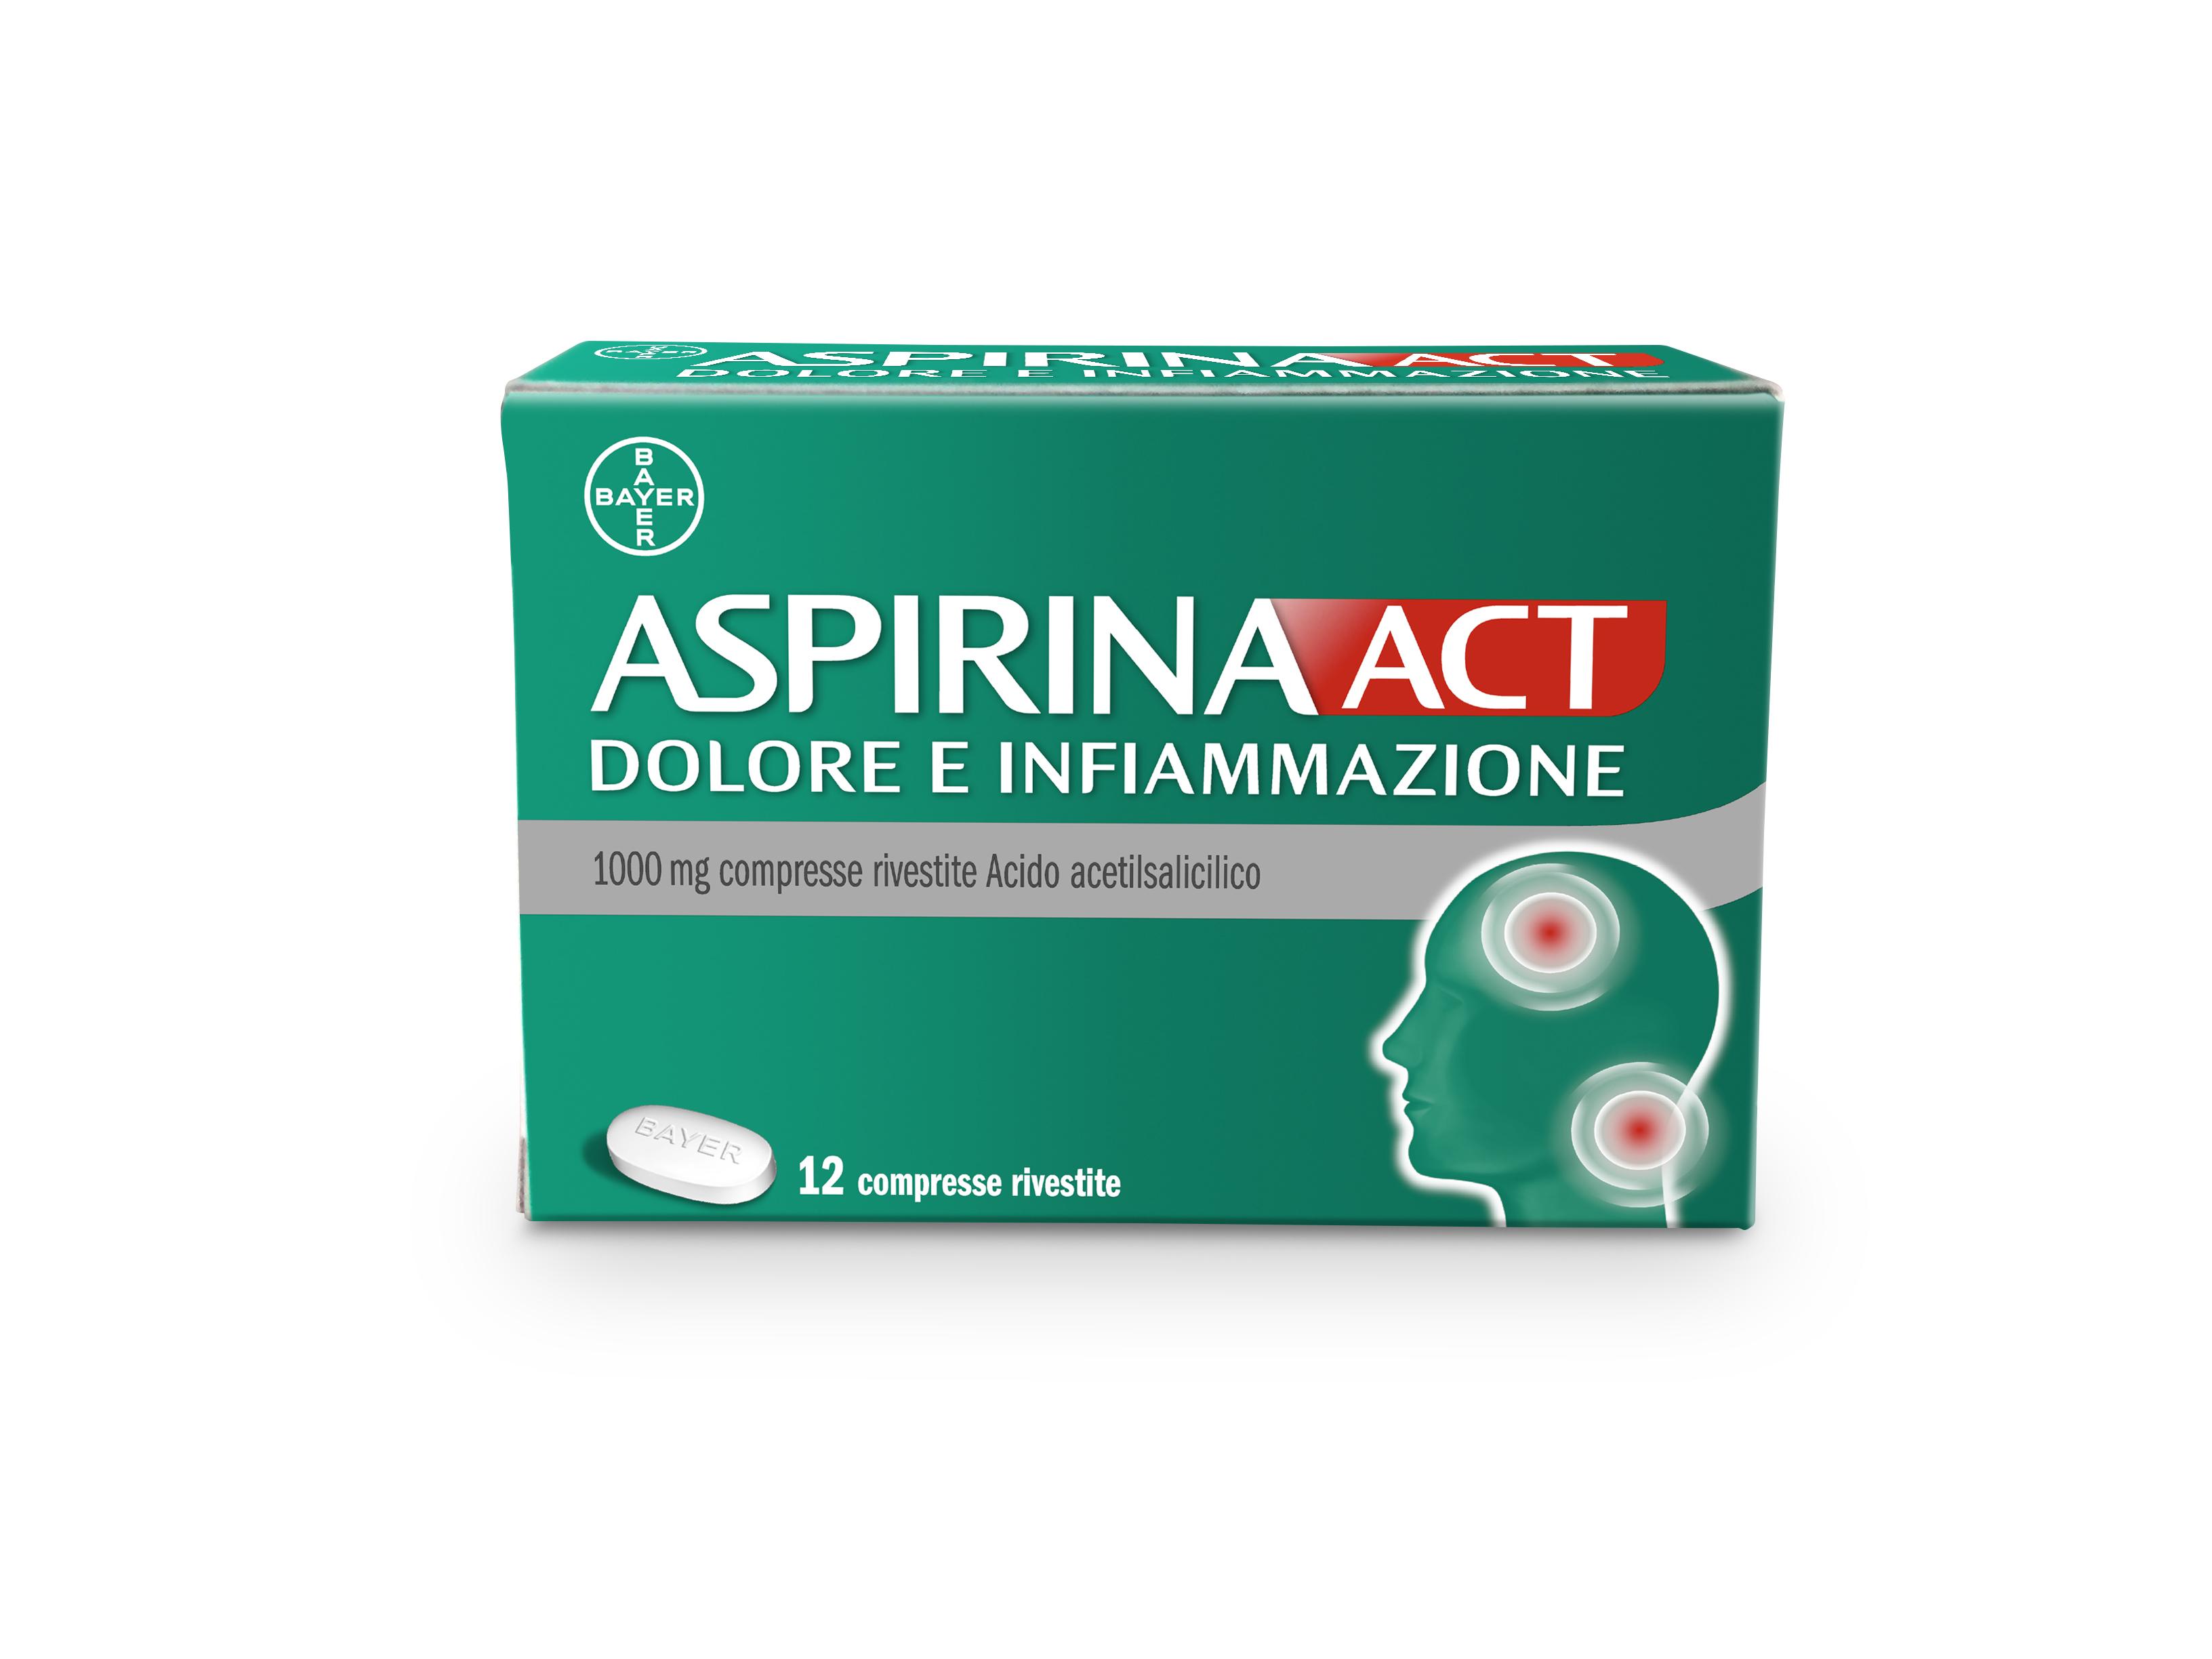 ASPIRINAACT DOL INF*12CPR 1G - Farmacia Barni